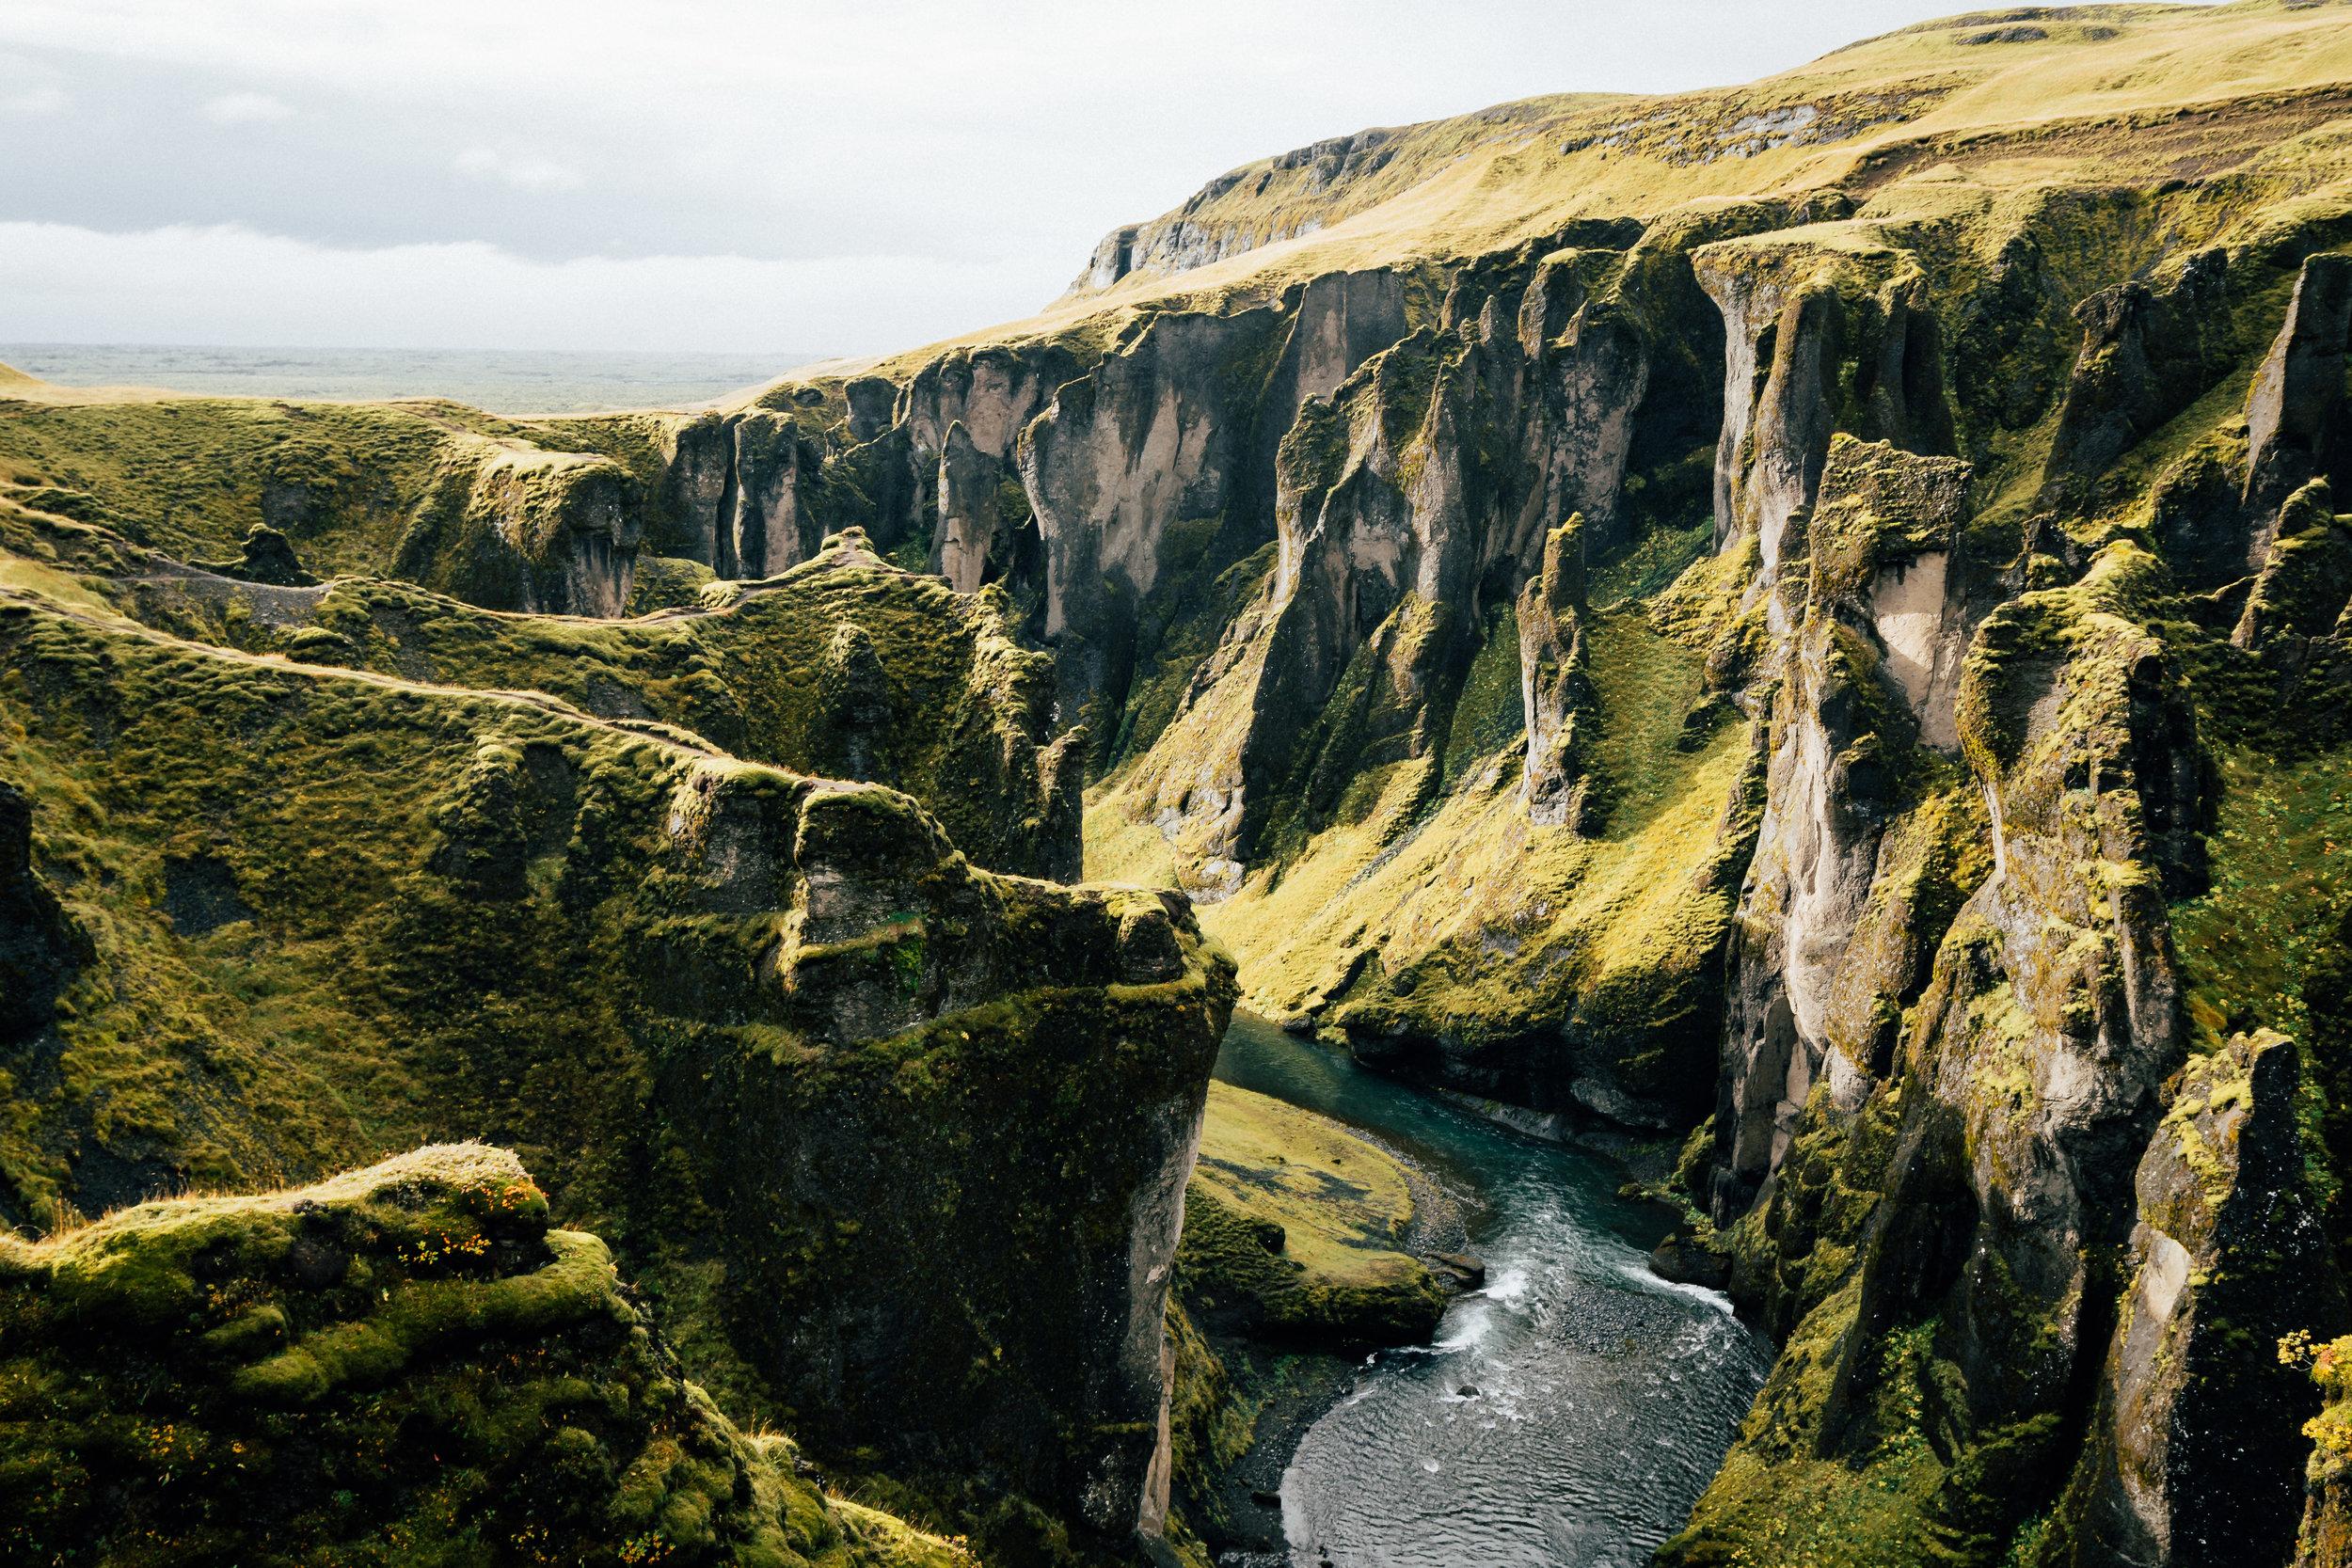 Iceland_2016 (59 of 170) copy.jpg